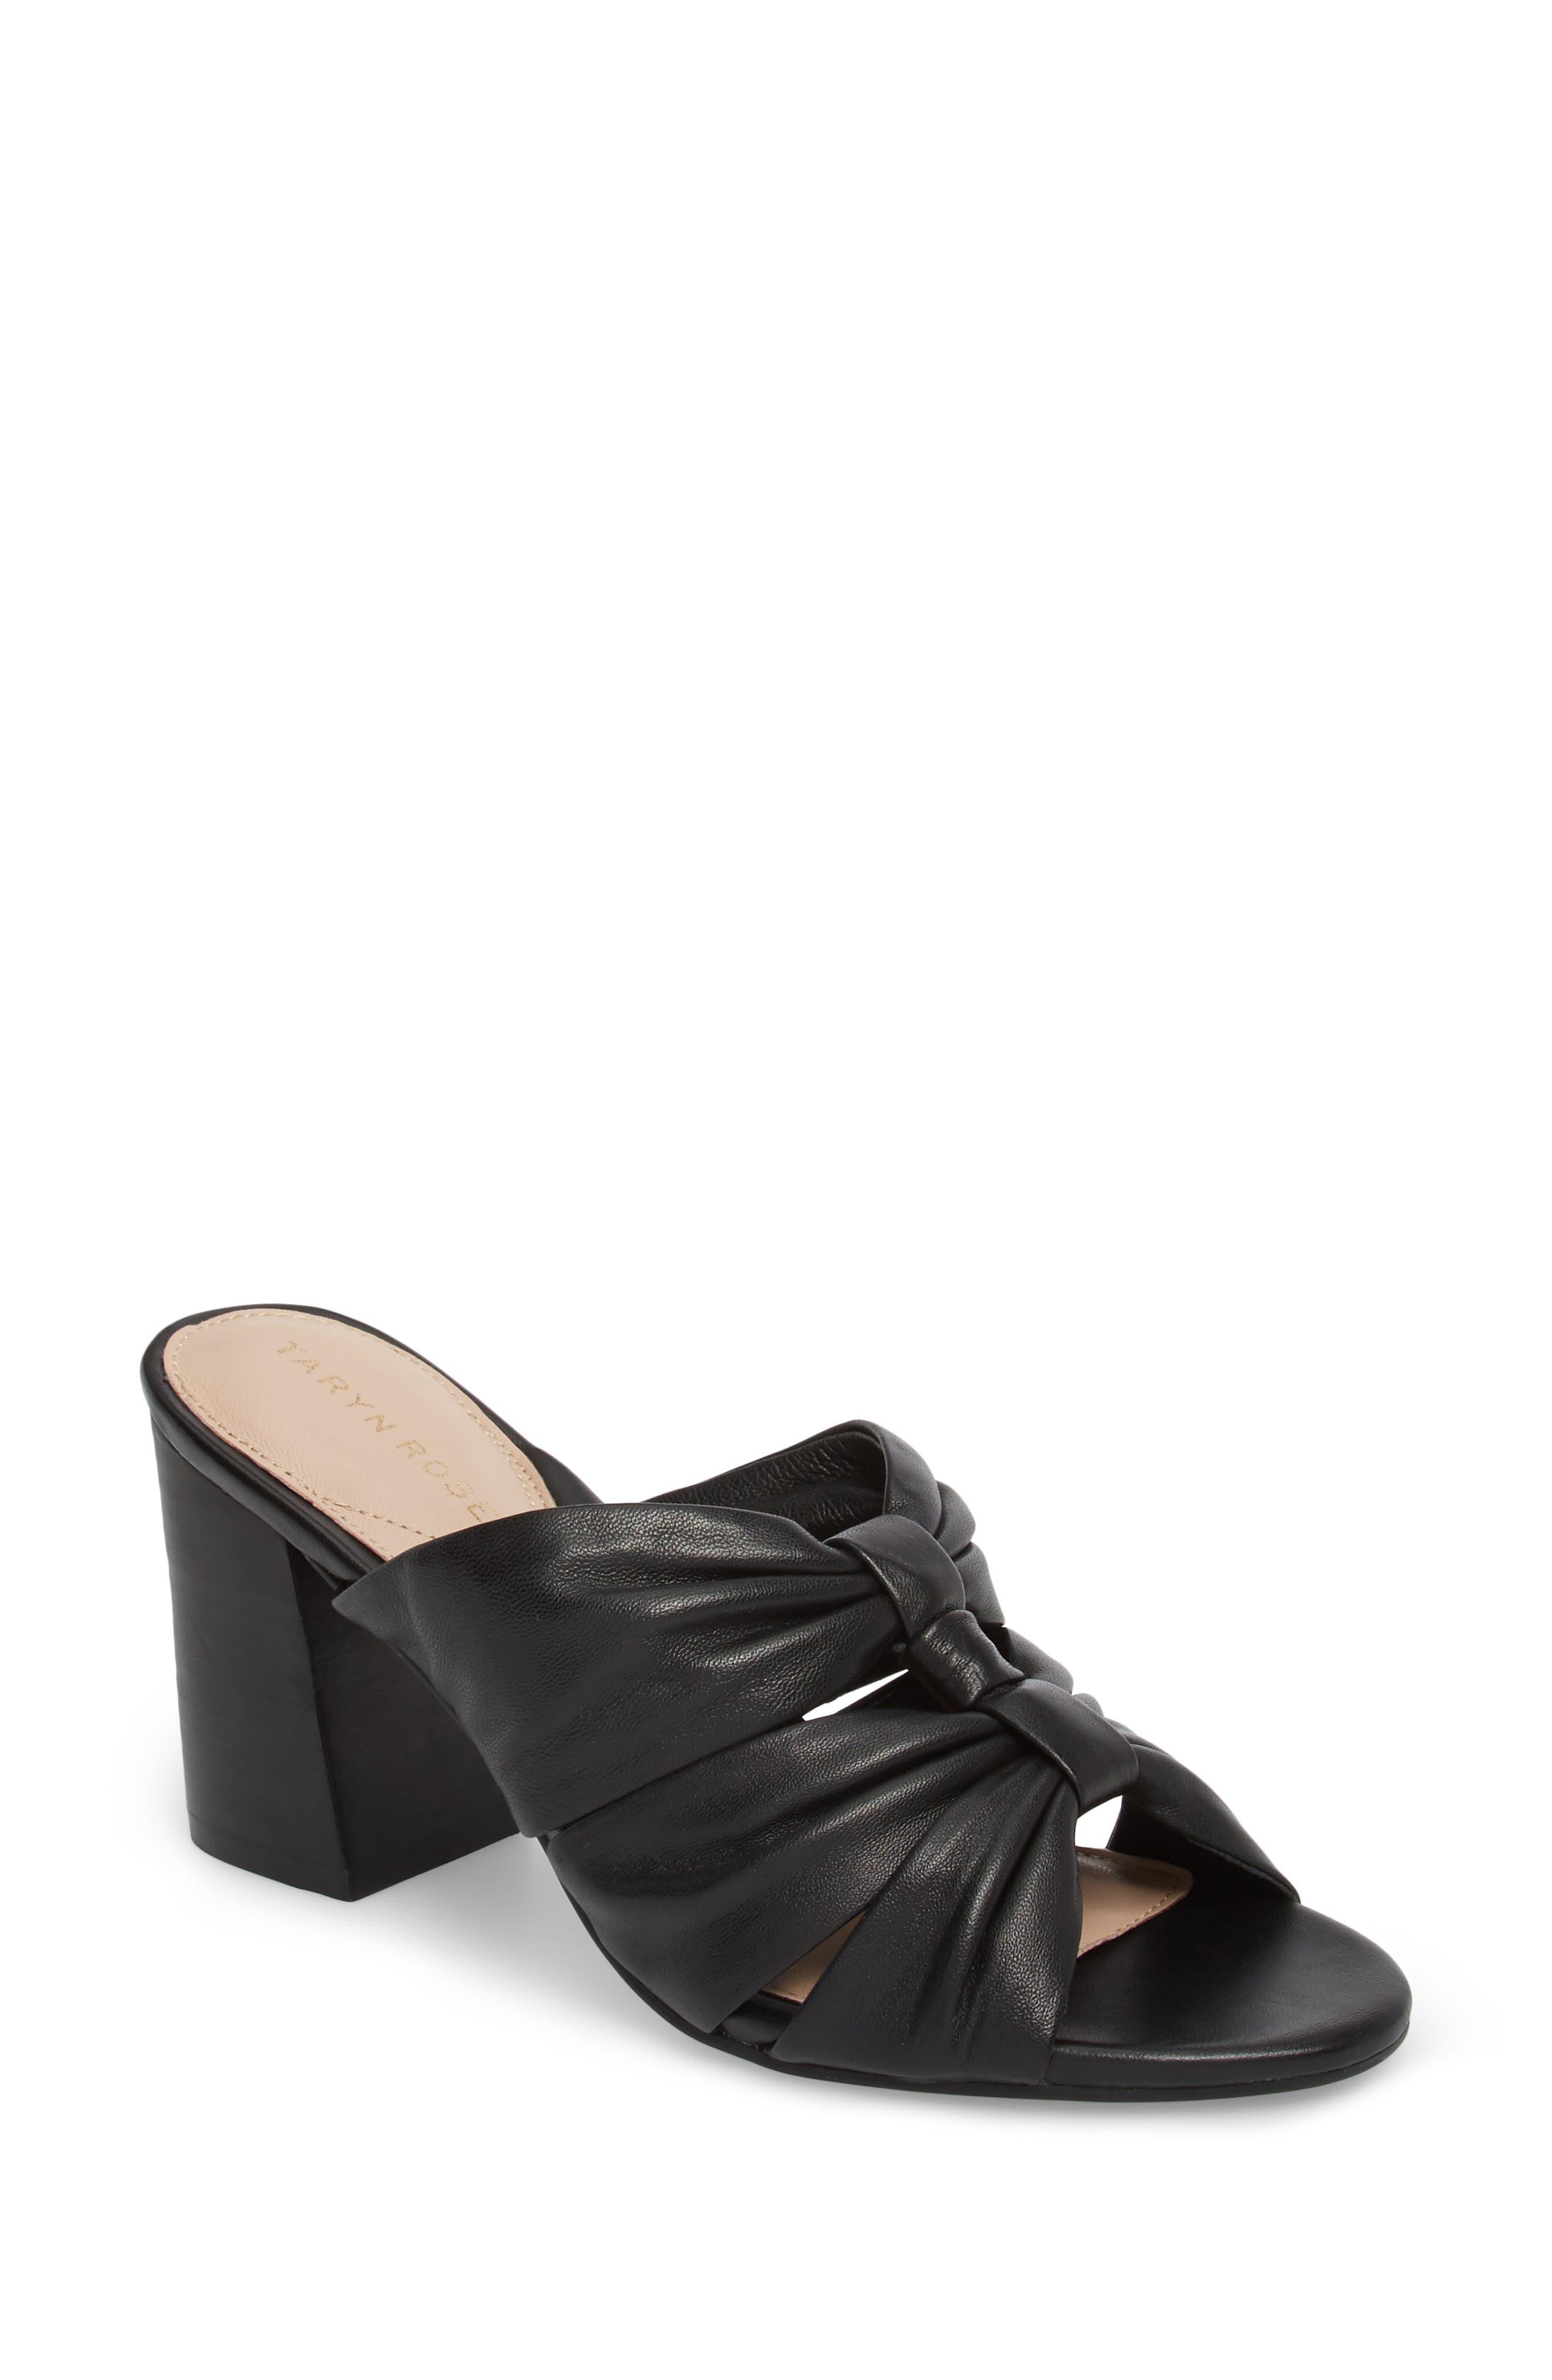 Alternate Image 1 Selected - Taryn Rose Lana Cinched Strap Sandal (Women)